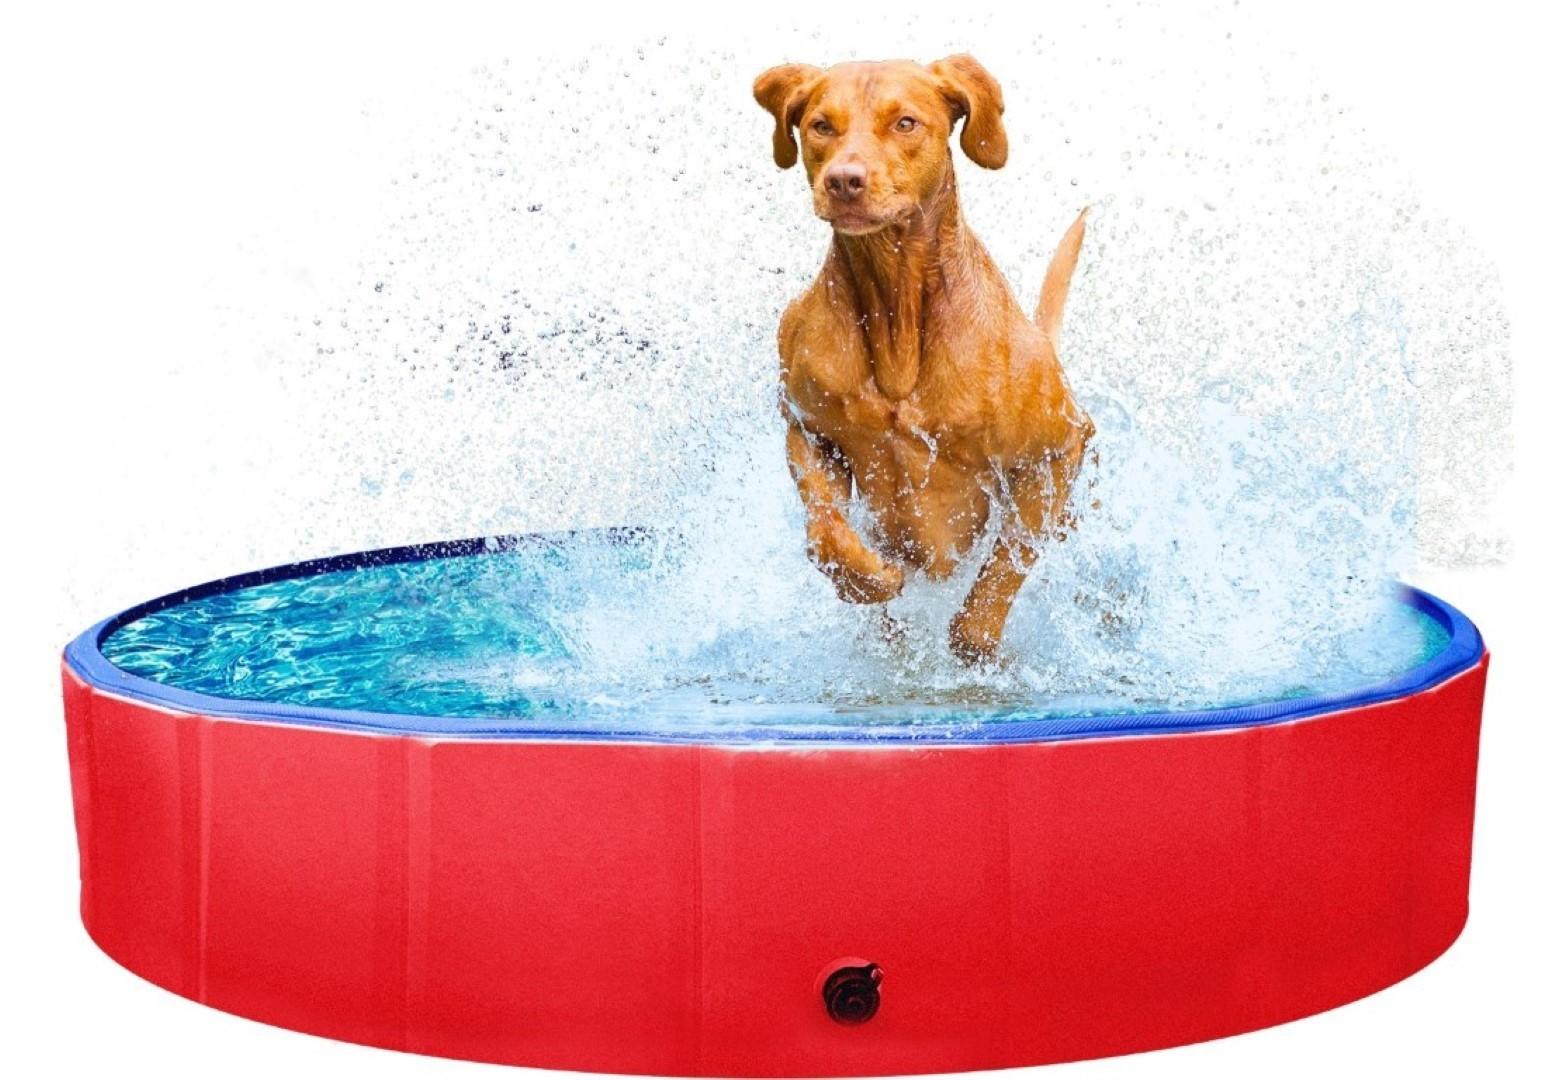 Kowloon hondenzwembad anti-slip 160x30 cm (L) rood/blauw